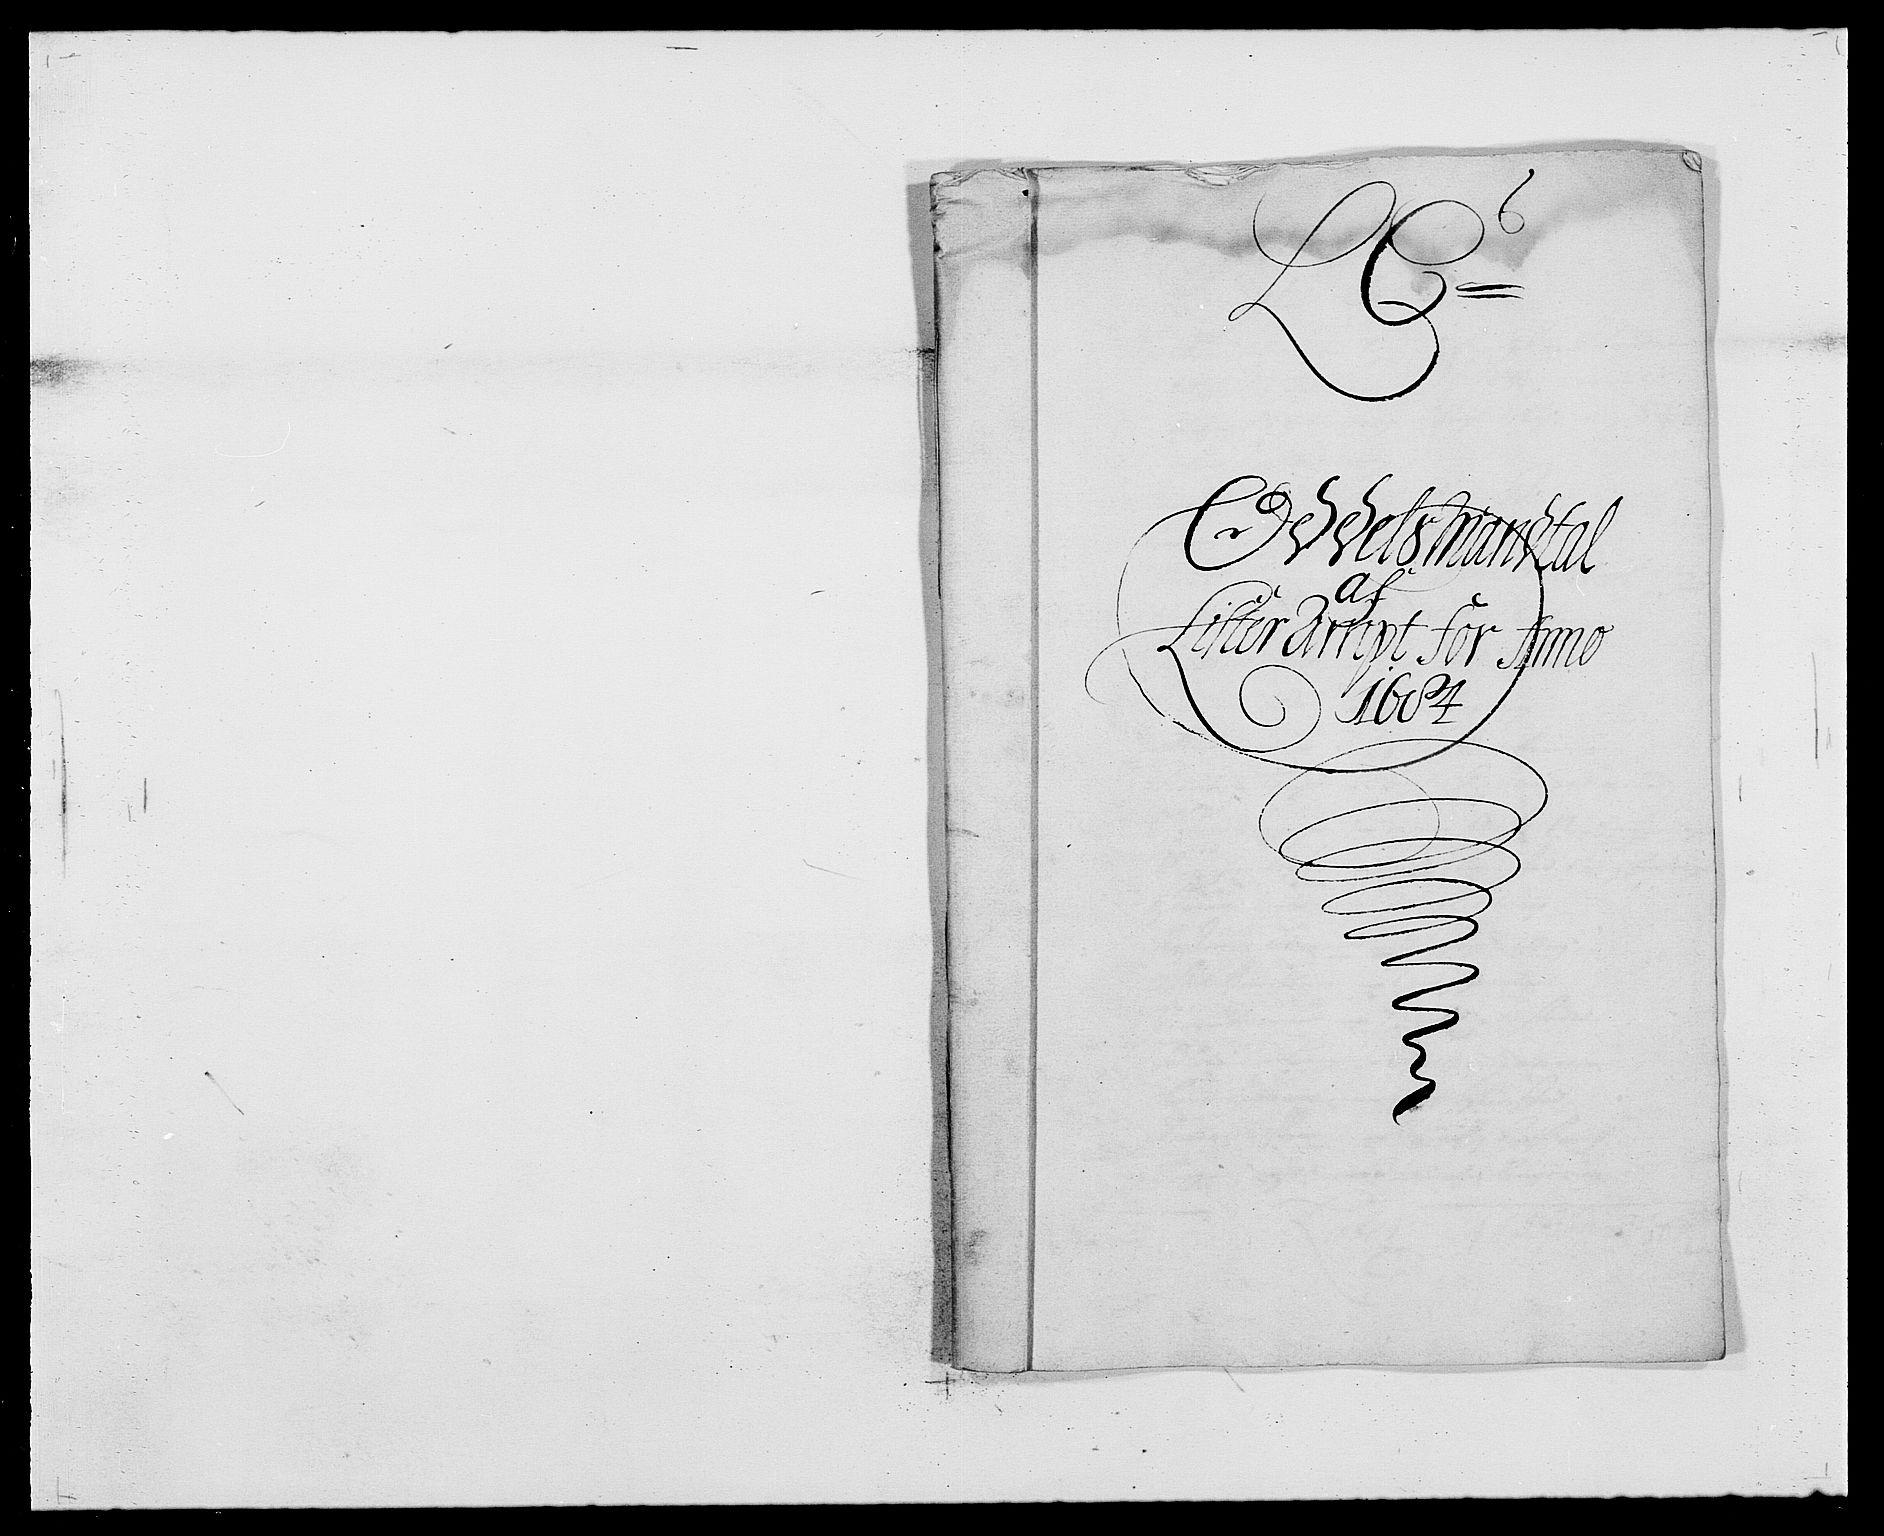 RA, Rentekammeret inntil 1814, Reviderte regnskaper, Fogderegnskap, R41/L2533: Fogderegnskap Lista, 1684-1685, s. 61